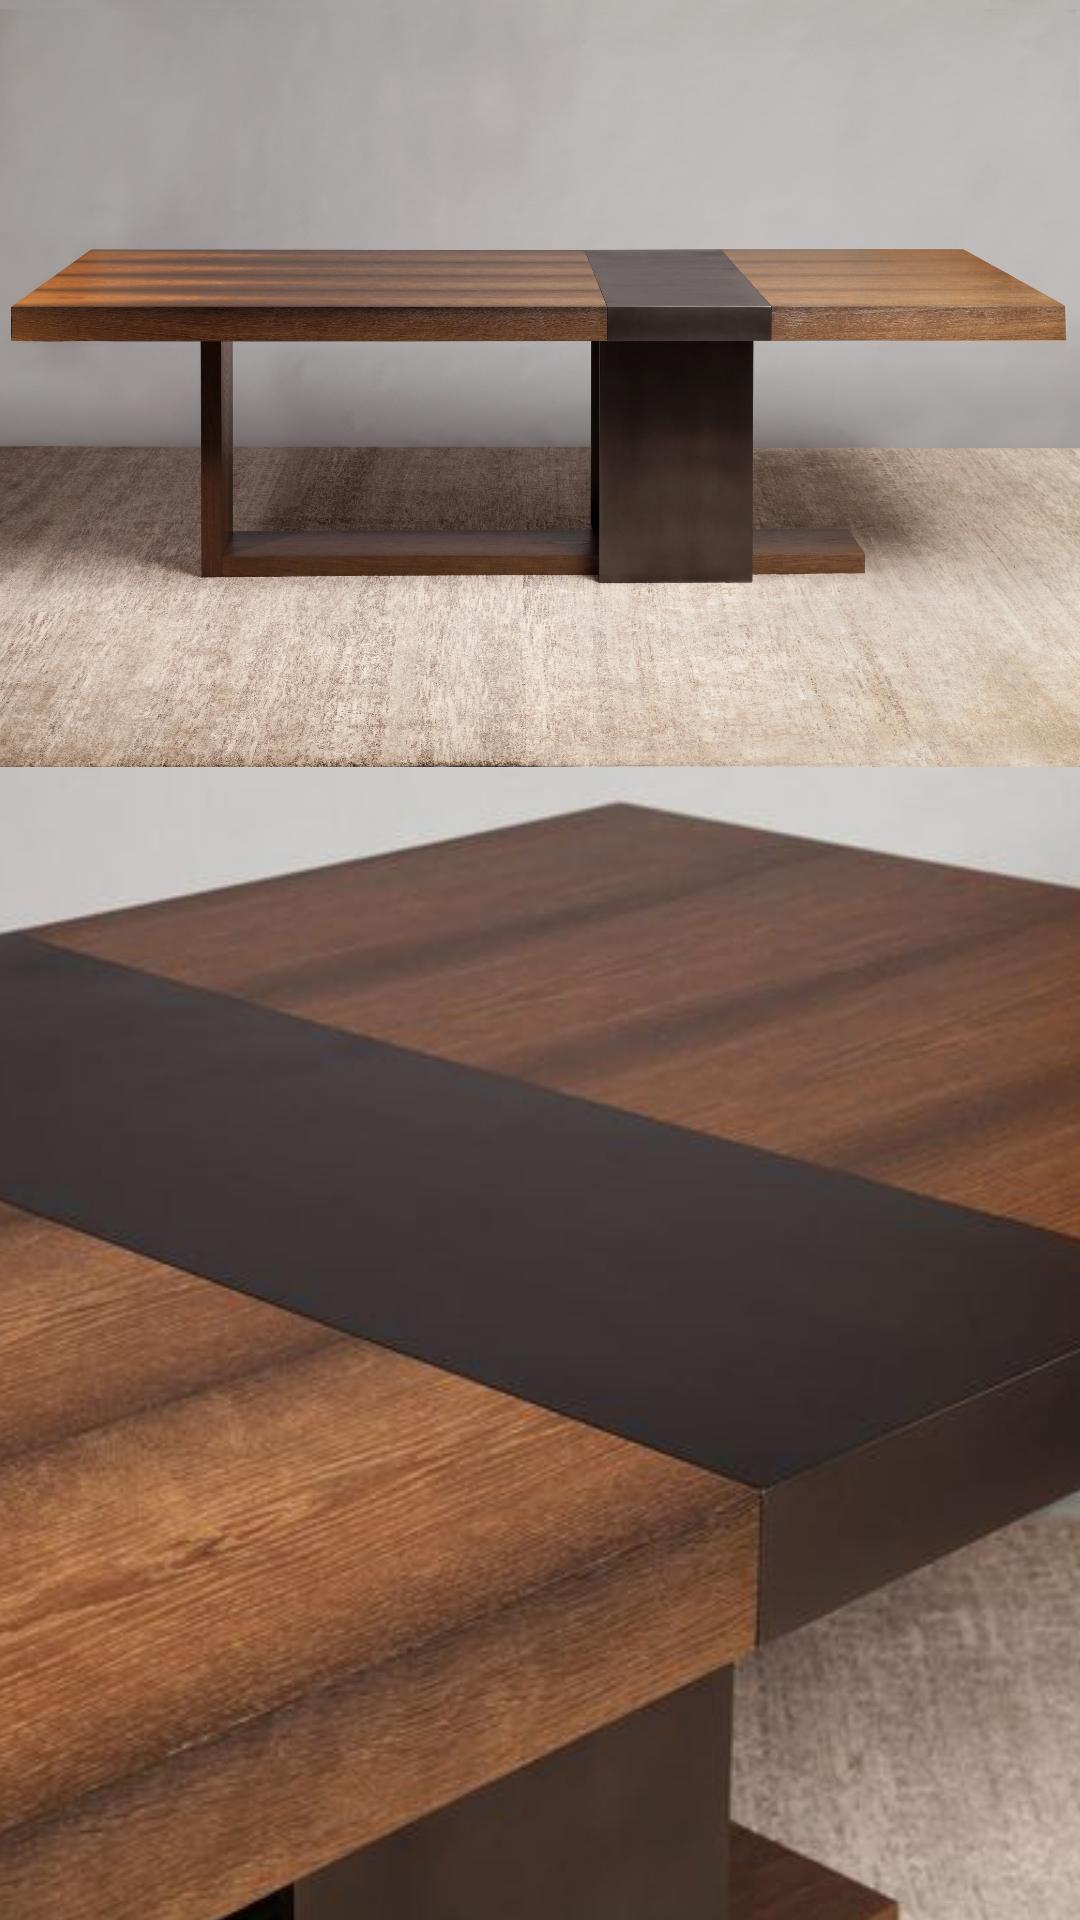 Seattle S Luma Design Workshop S Strap Dining Table Wood Table Design Furniture Design Modern Office Decor